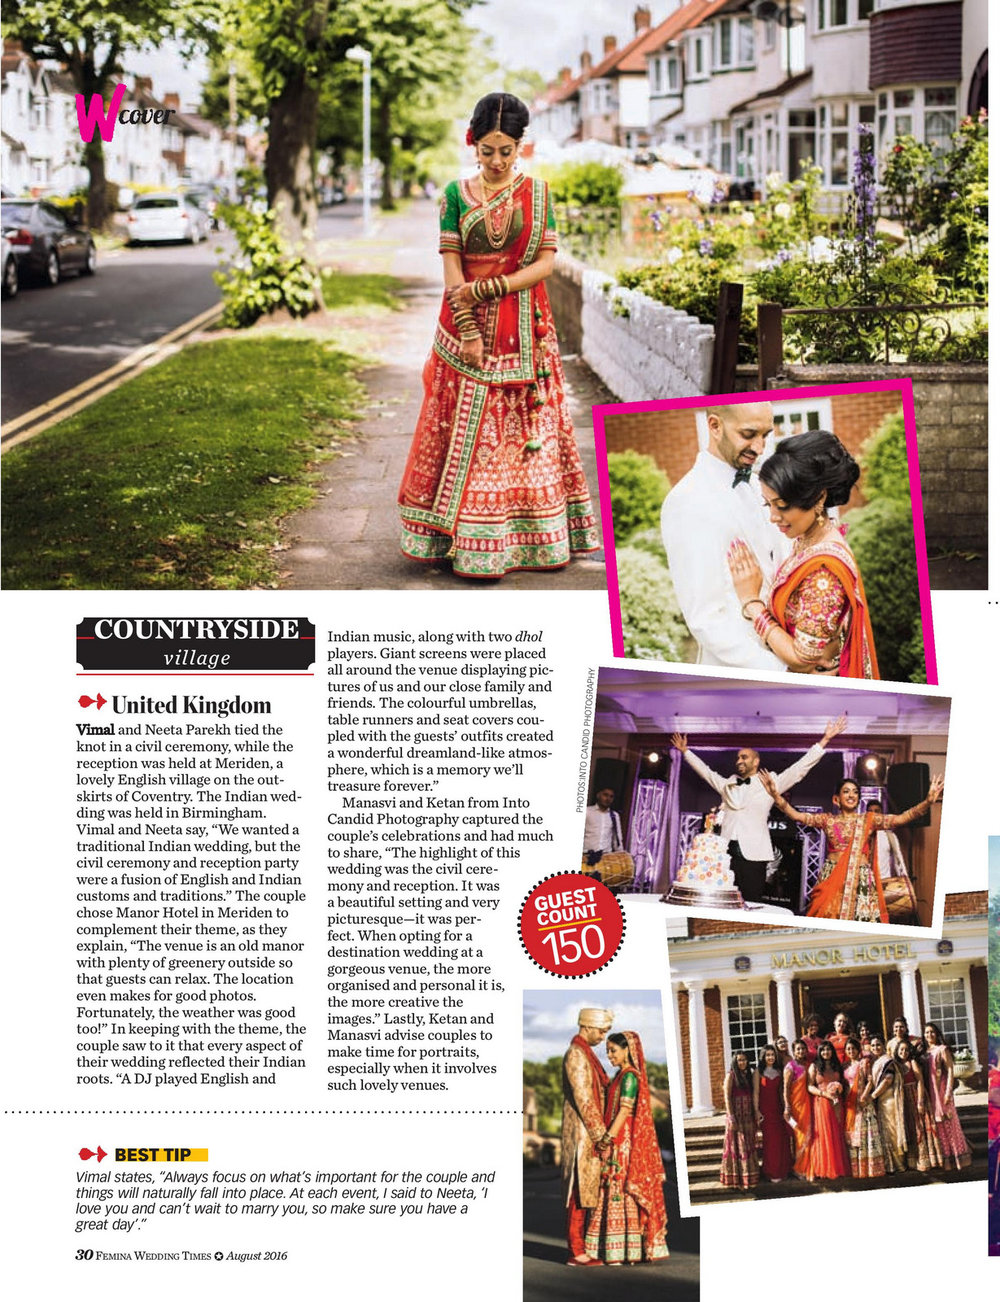 uk-wedding-photography-destination-intocandid-wedding-weddingtimes-photographers-ketan-manasvi-photographer2.jpg